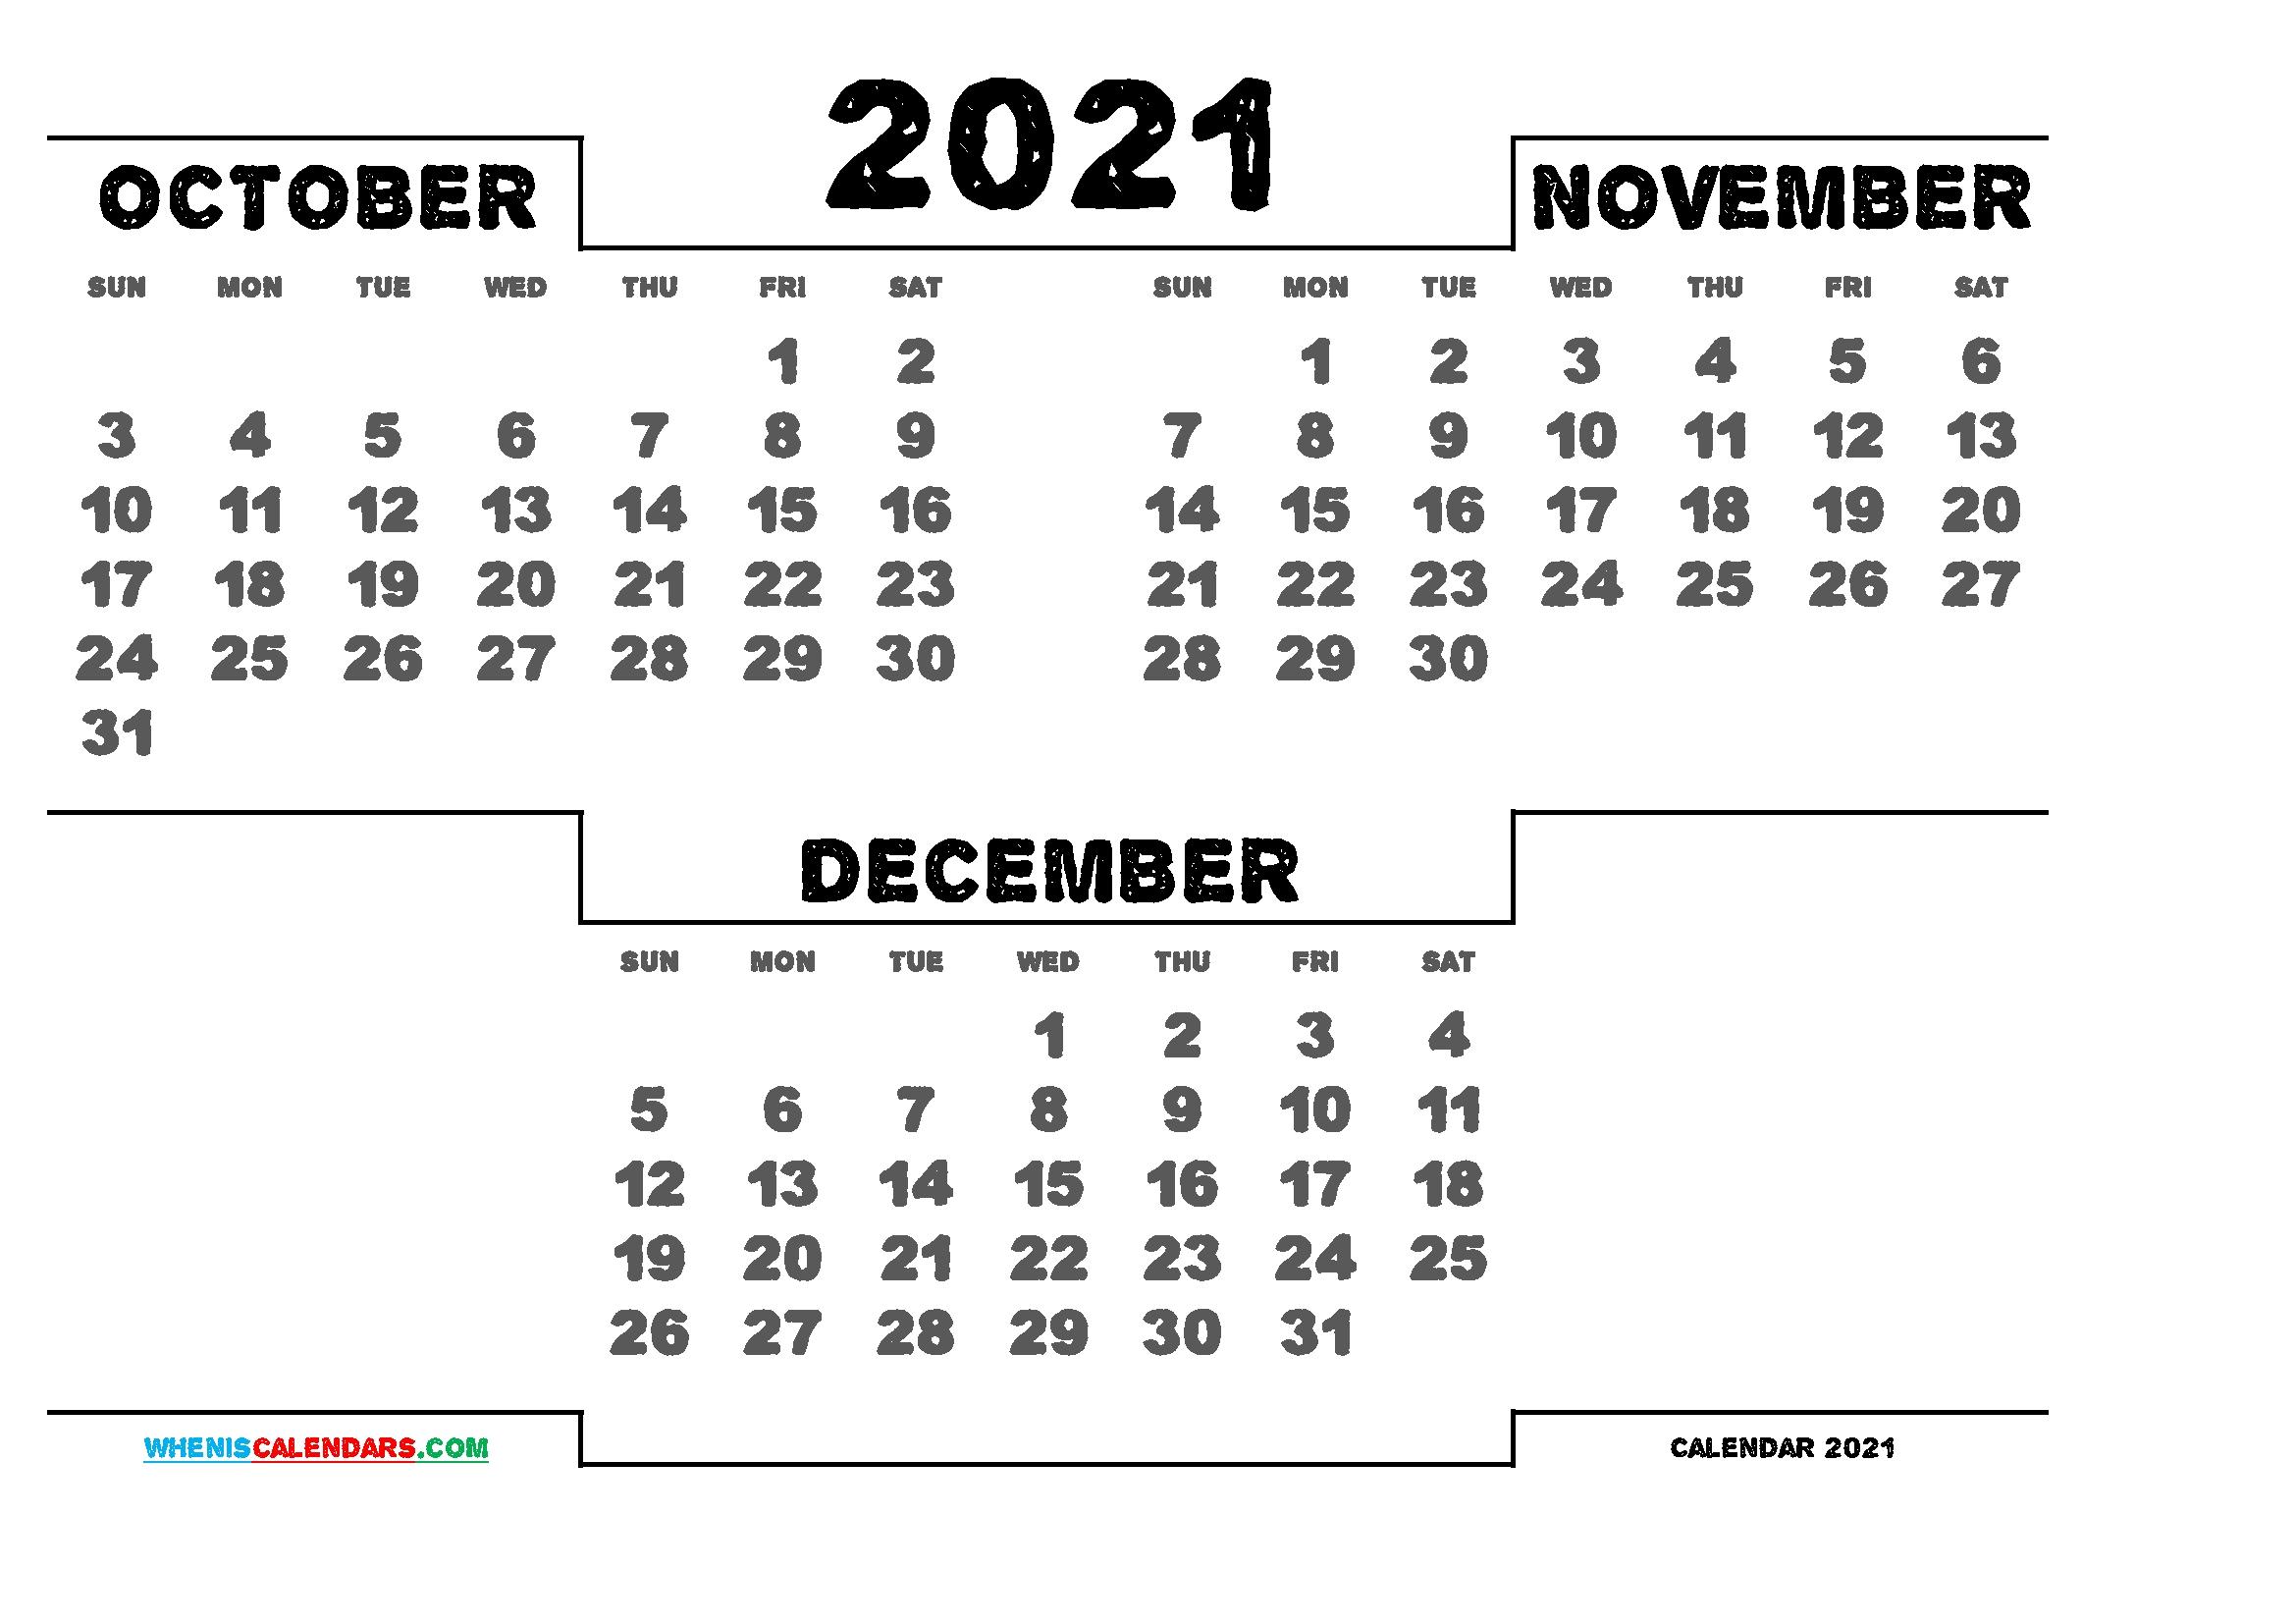 October Through December 2021 Calendar | 2021 Calendar October November December 2021 Calendar